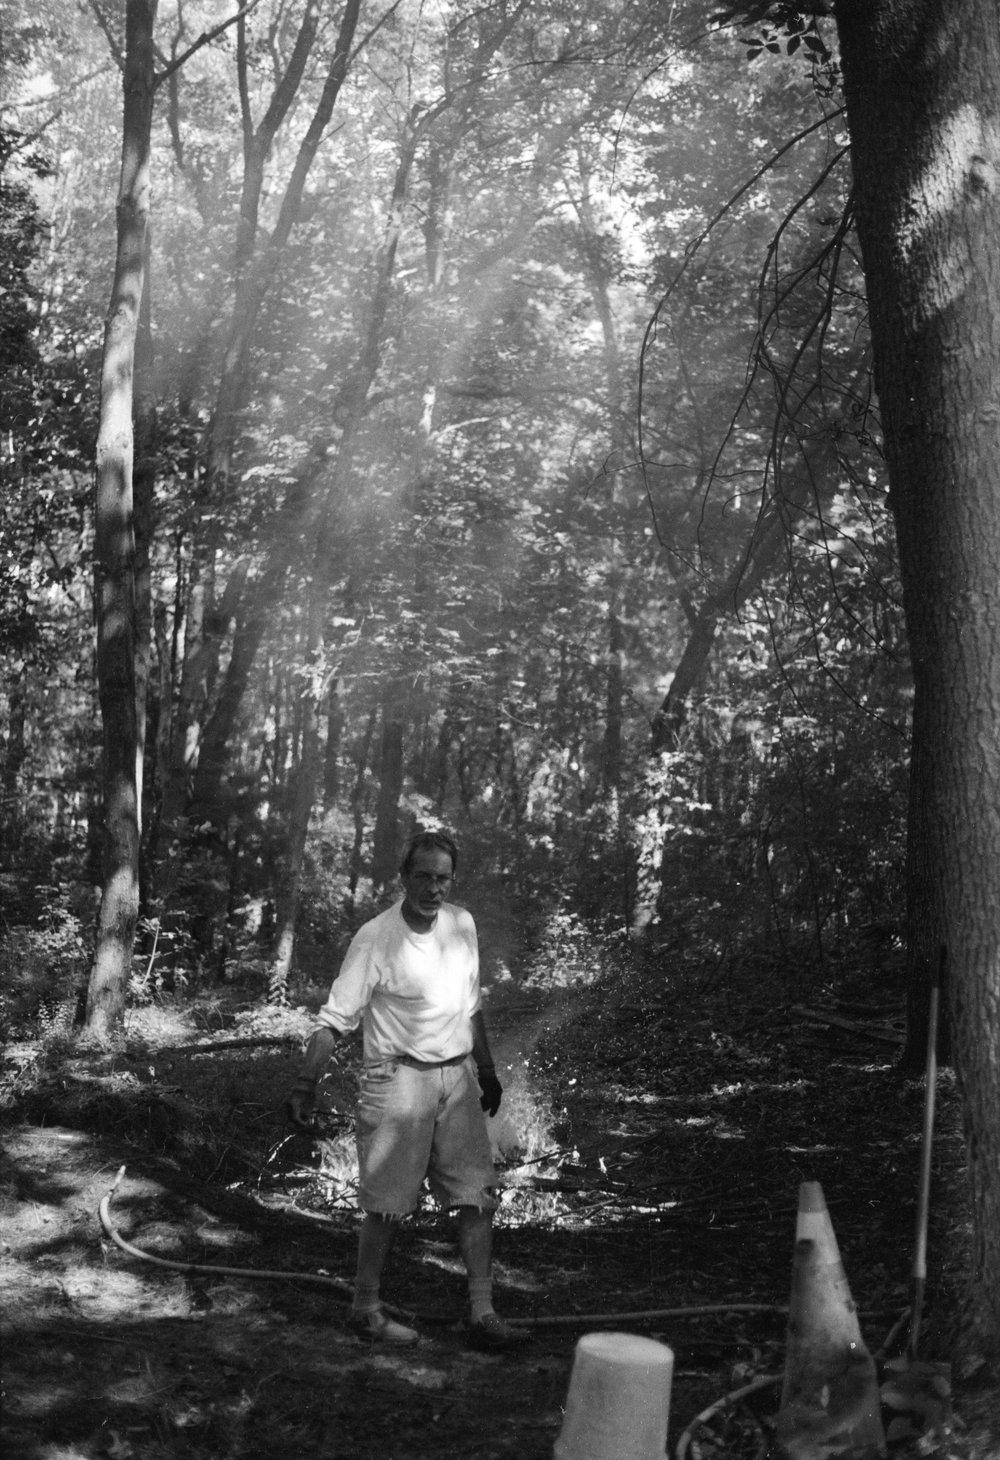 mel in woods dng copy.jpg